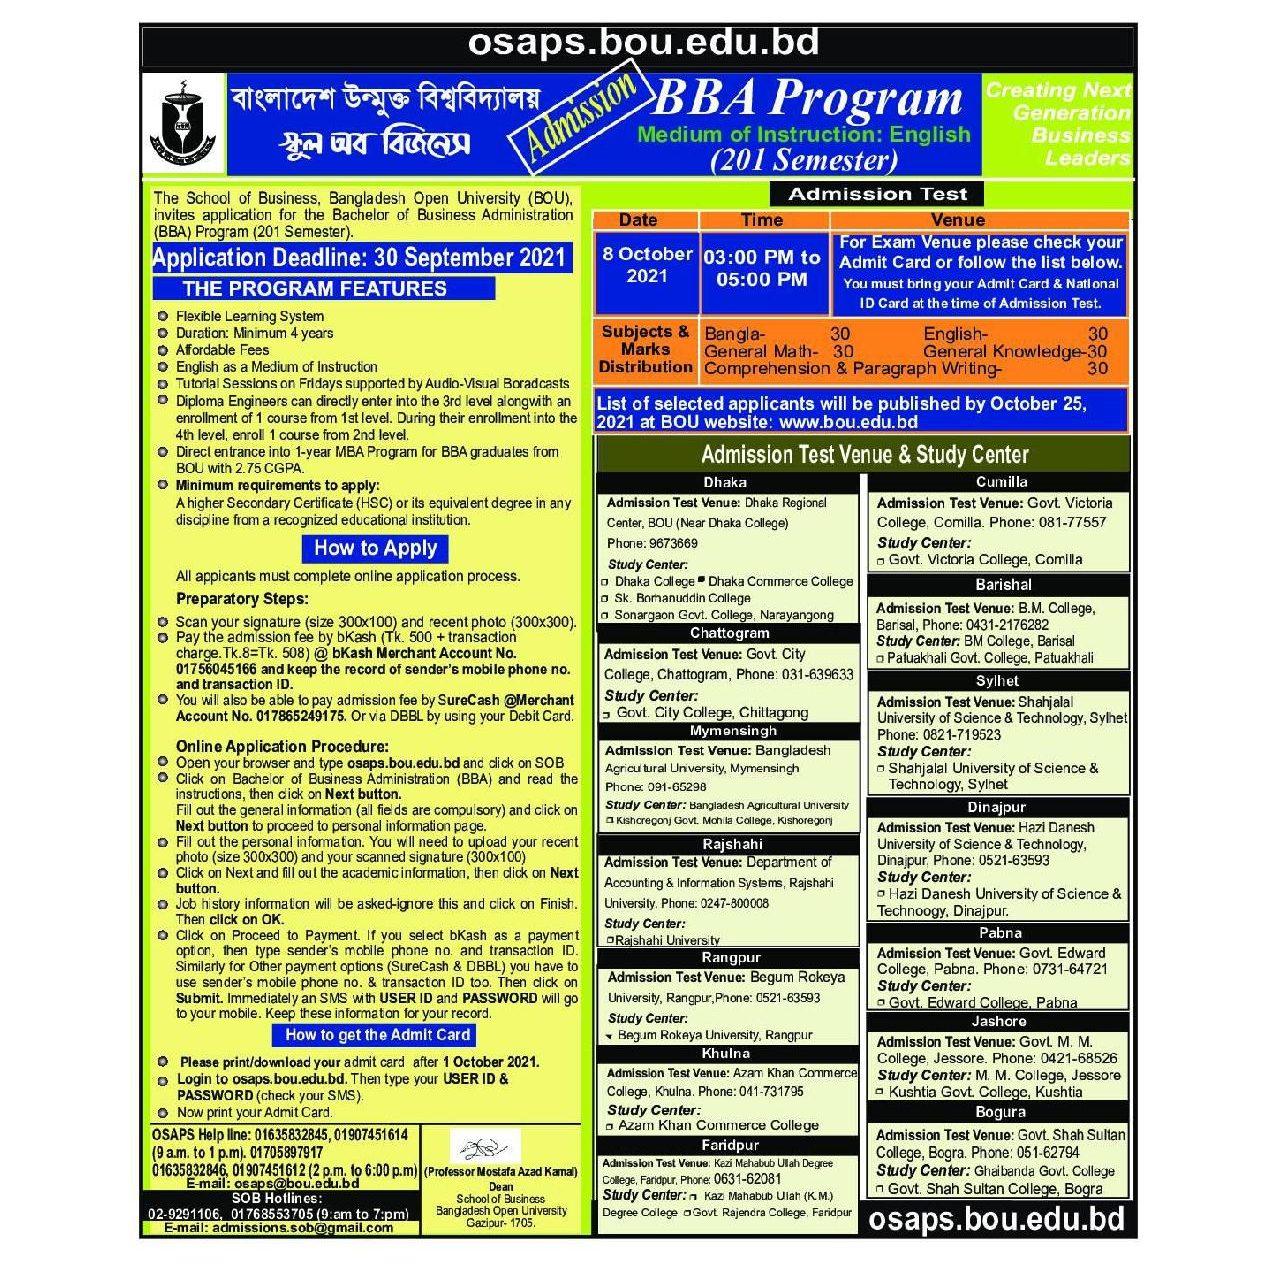 BOU BBA Programm 201 Semister Admission cercualr 2021-page-001